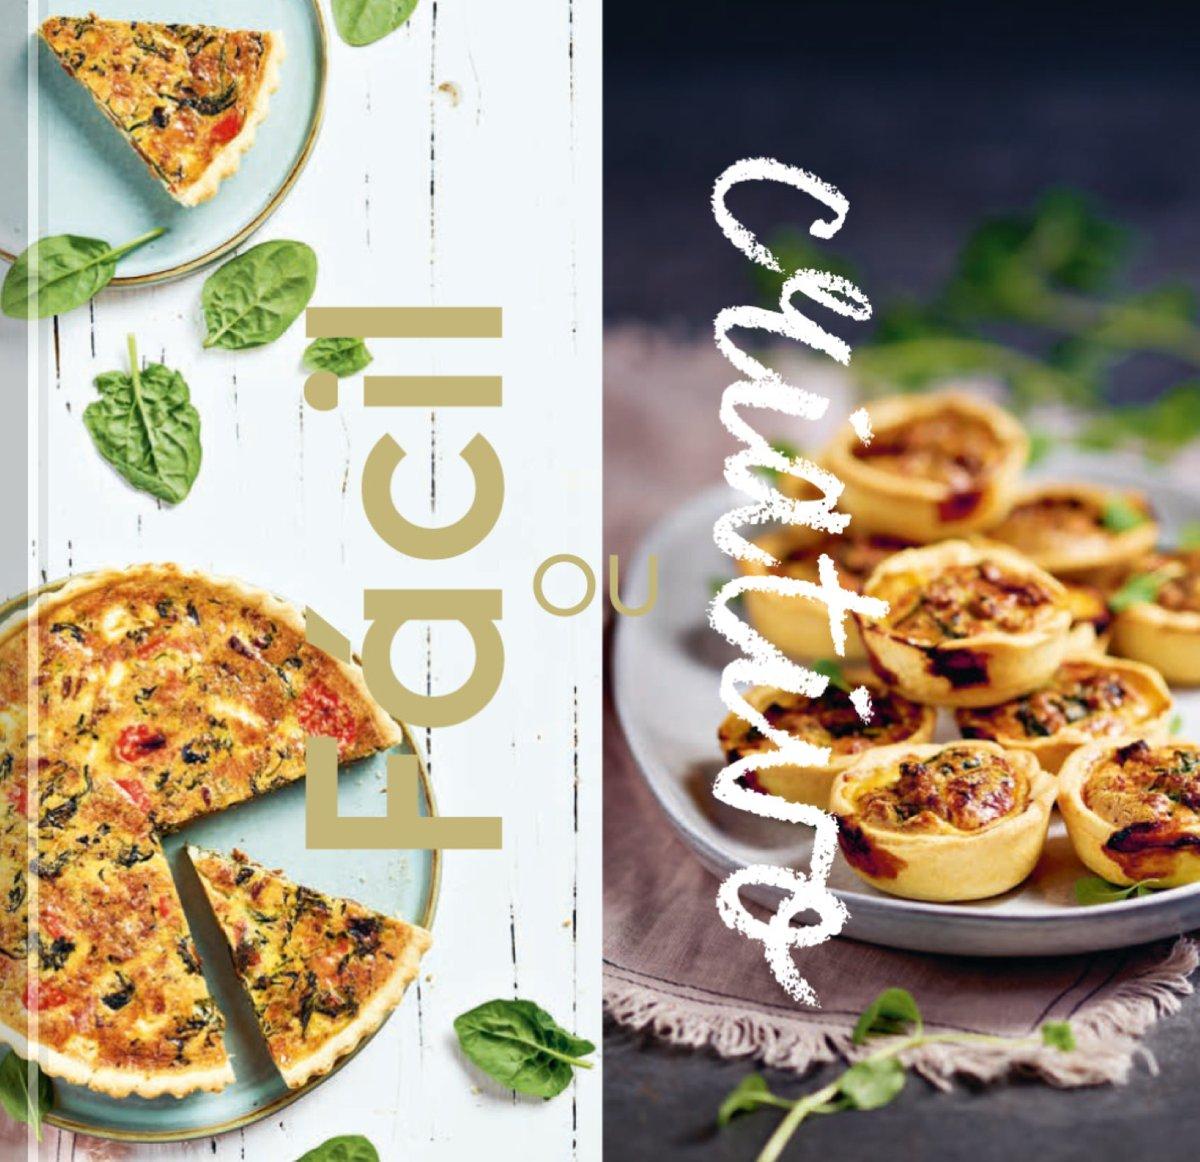 "Cookidoo®: Colecção ""Fácil ou Criativo"" #bimby #thermomix #bimbyworld #truecooks #yougottaeatthis #foodstagram #yum #foodphotography #foodbloggers #instayum #instafood #food #homecooking #foodpics #foodlover #eatstagram #portuguese #portuguesefood #picof"